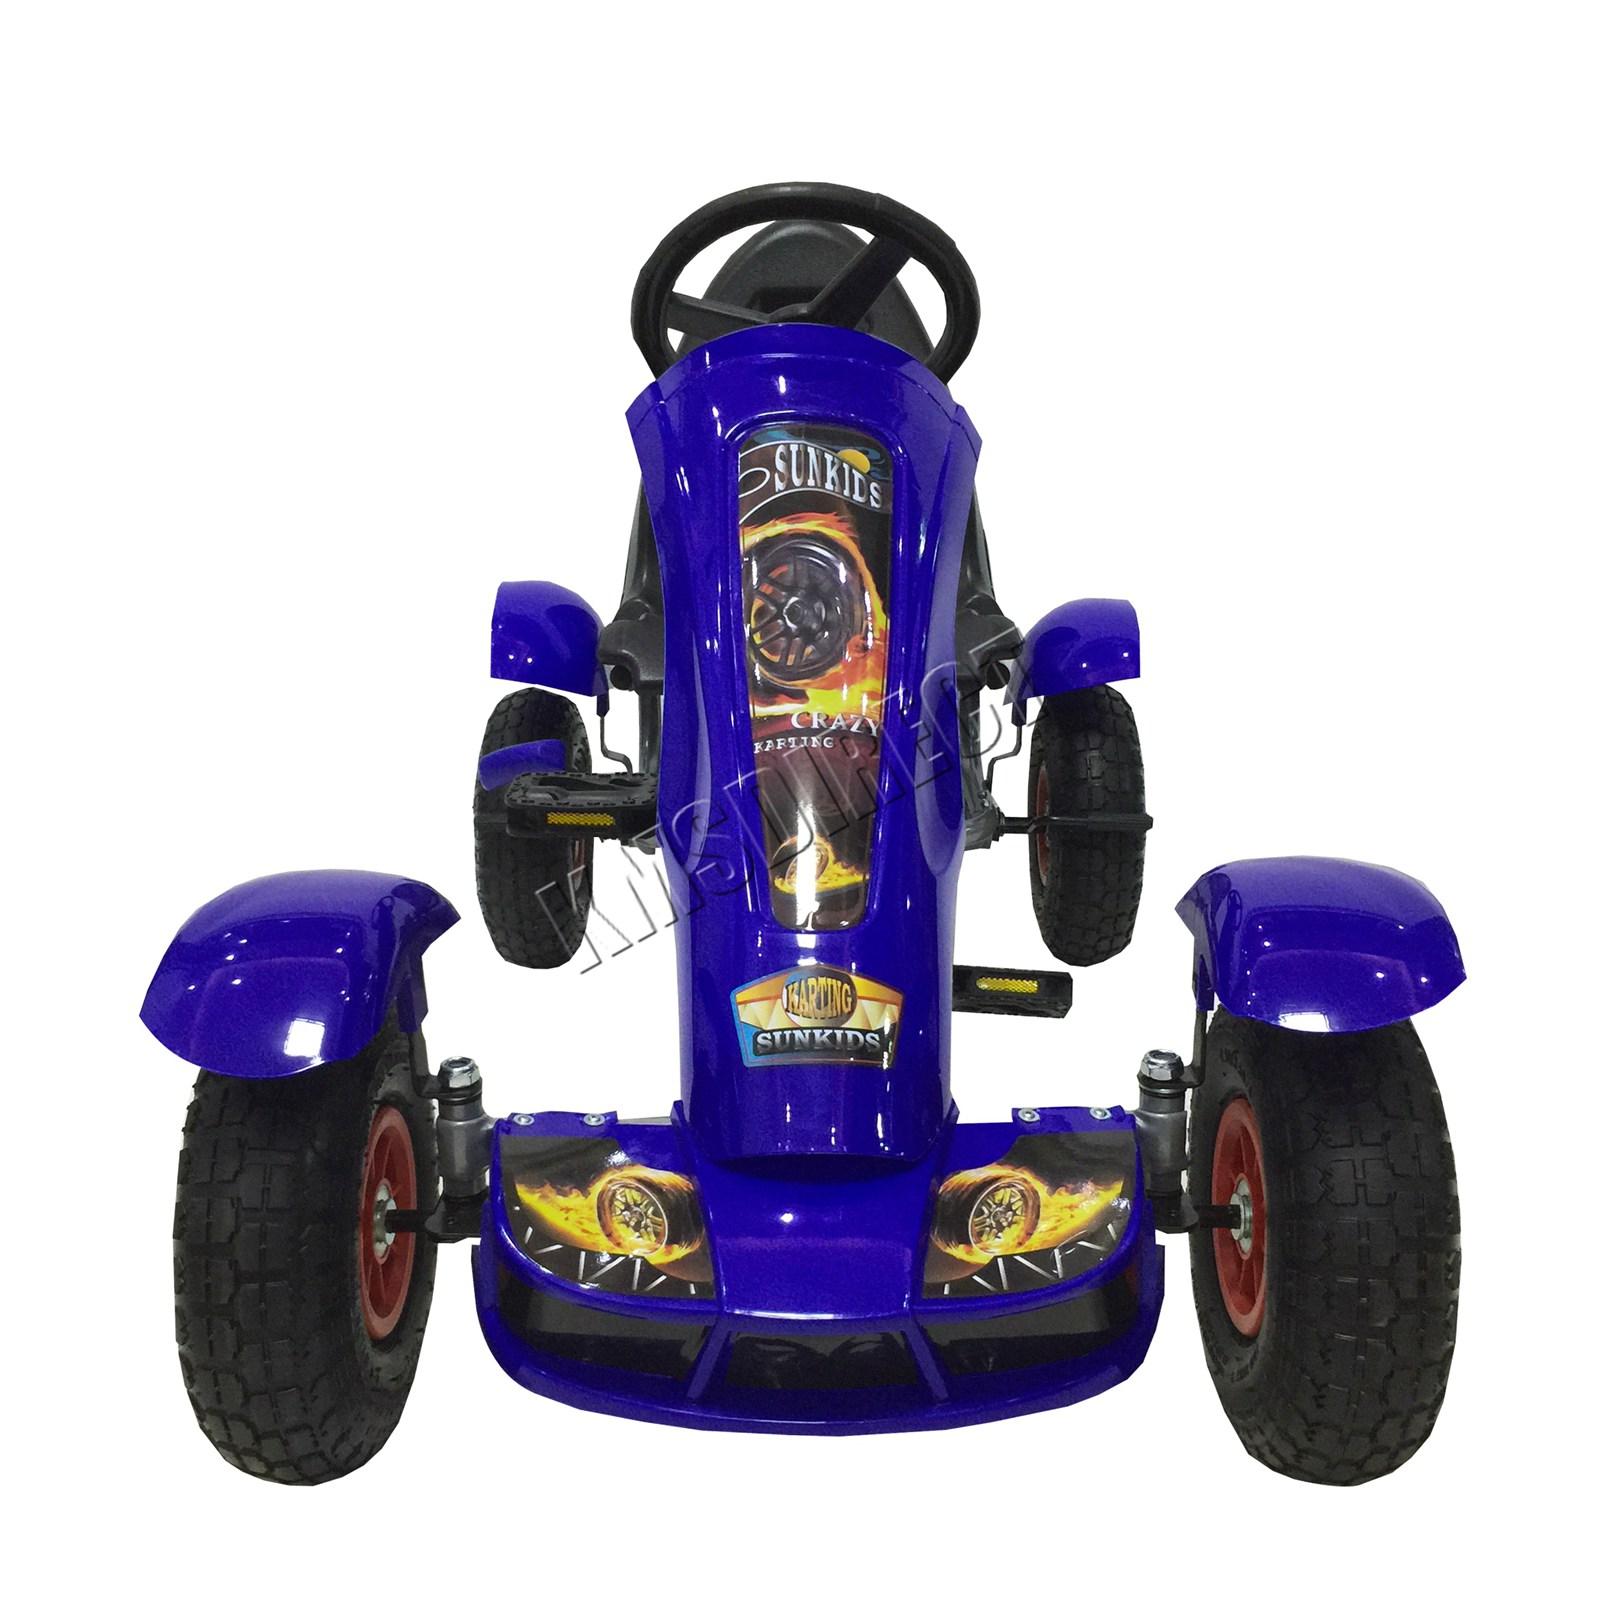 201701719267 2475 I 252 19 GOKART FH G03 BLUE KMSWM022 - Foxhunter Infantil Go Kart – Pedal Coche para Niños Gocart con Freno de Mano G03